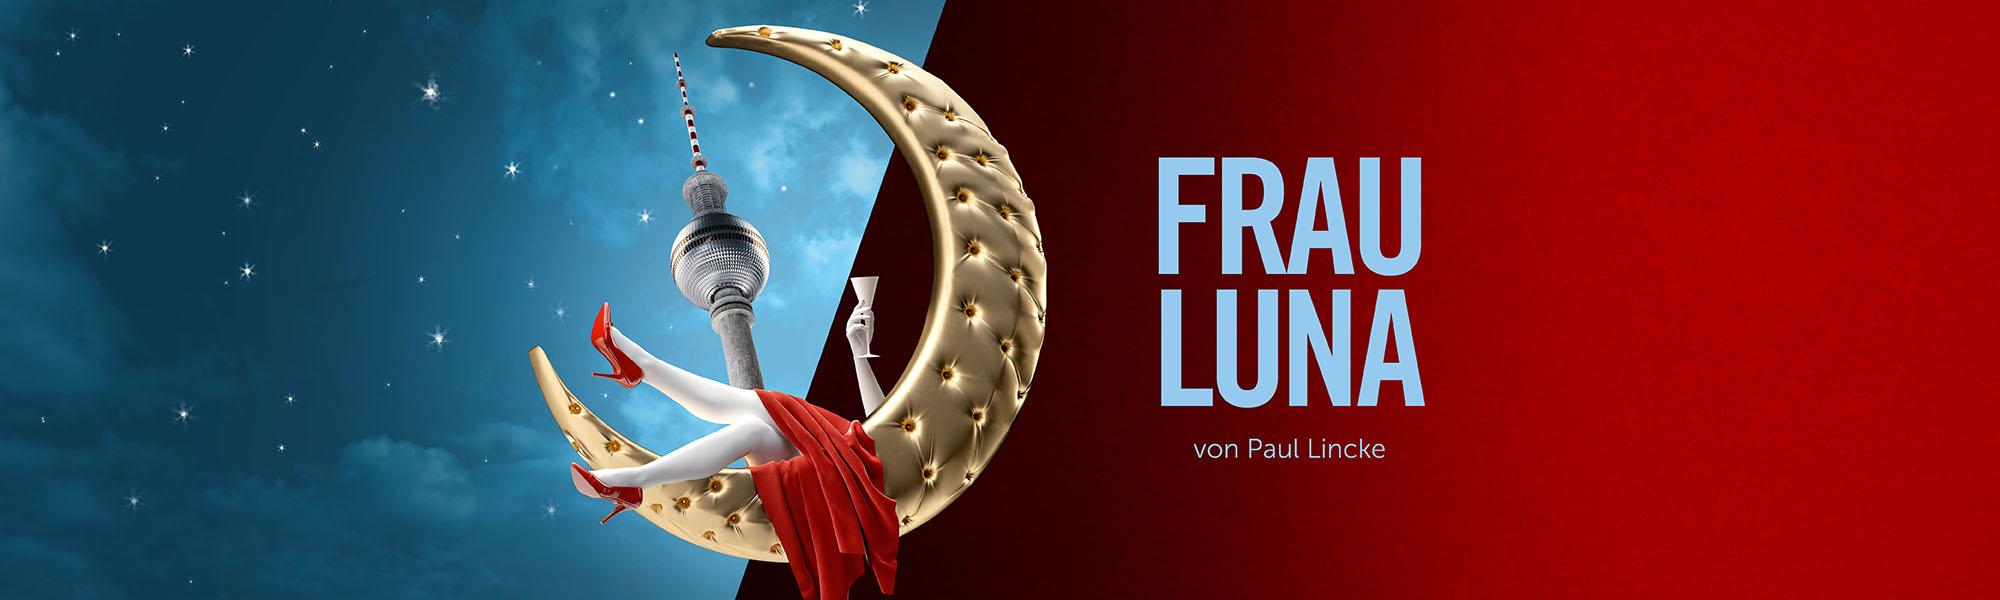 Frau Luna 2022 (Slider)